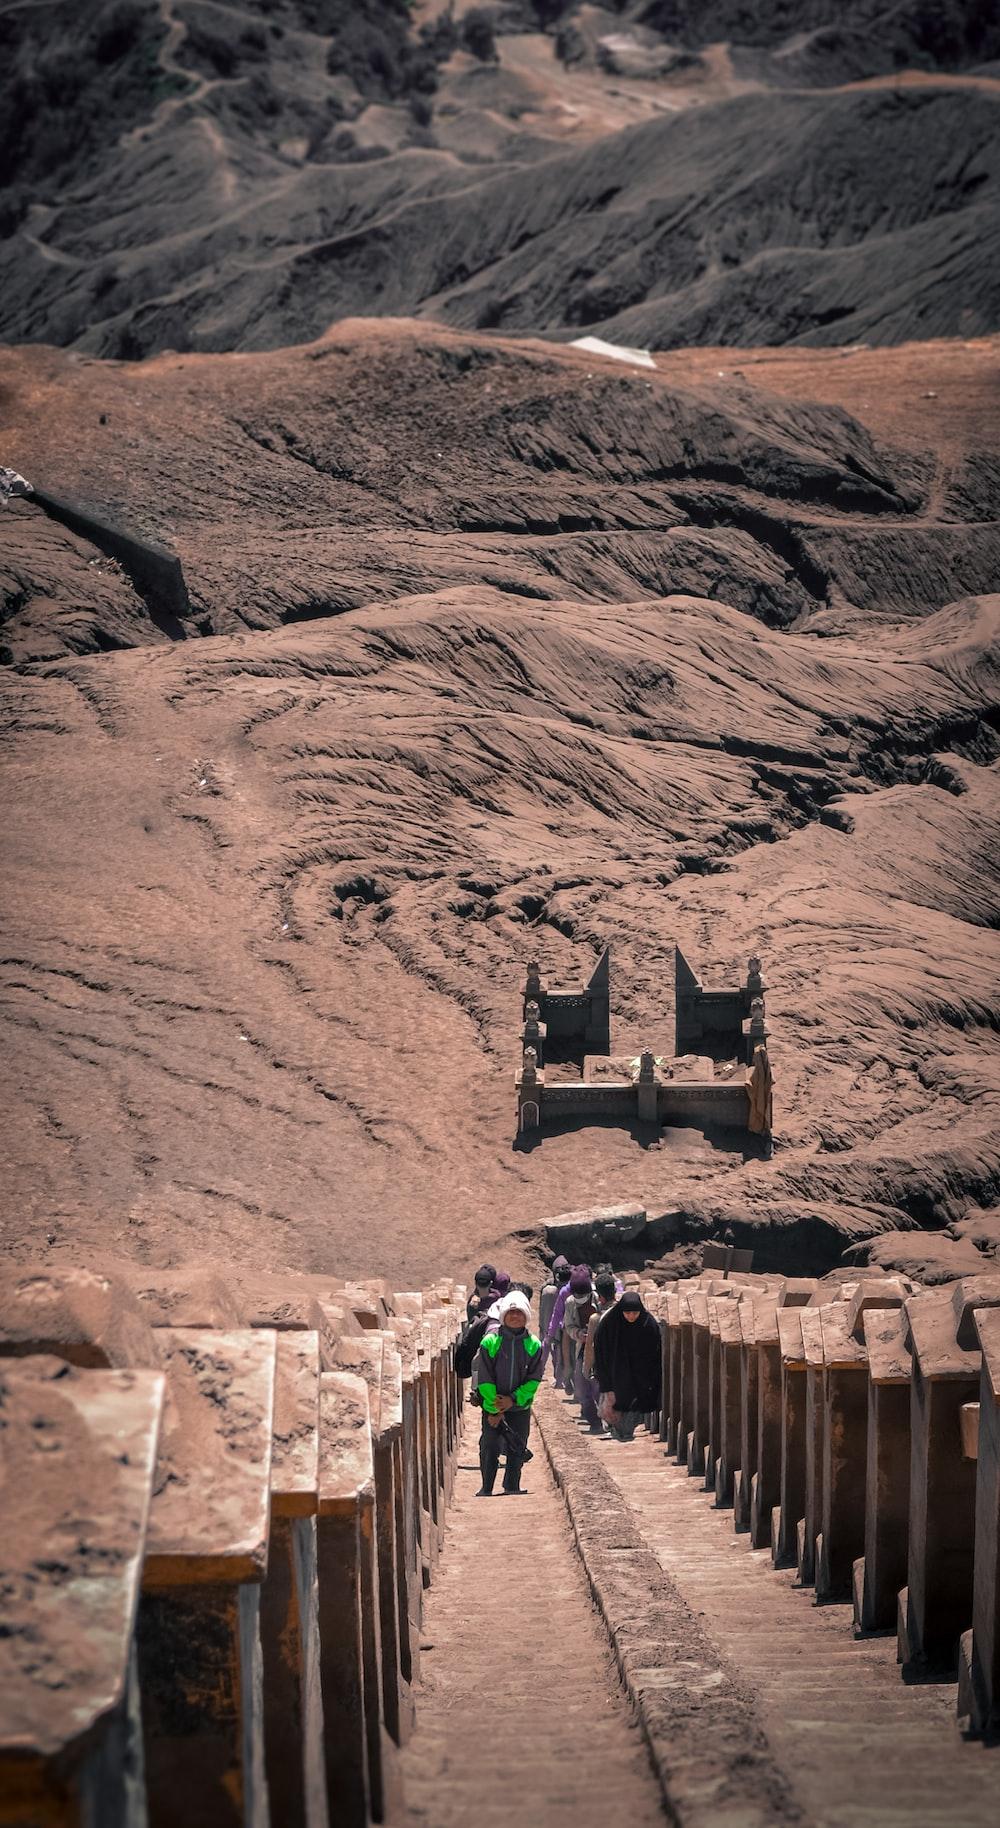 people walking on brown rock formation during daytime